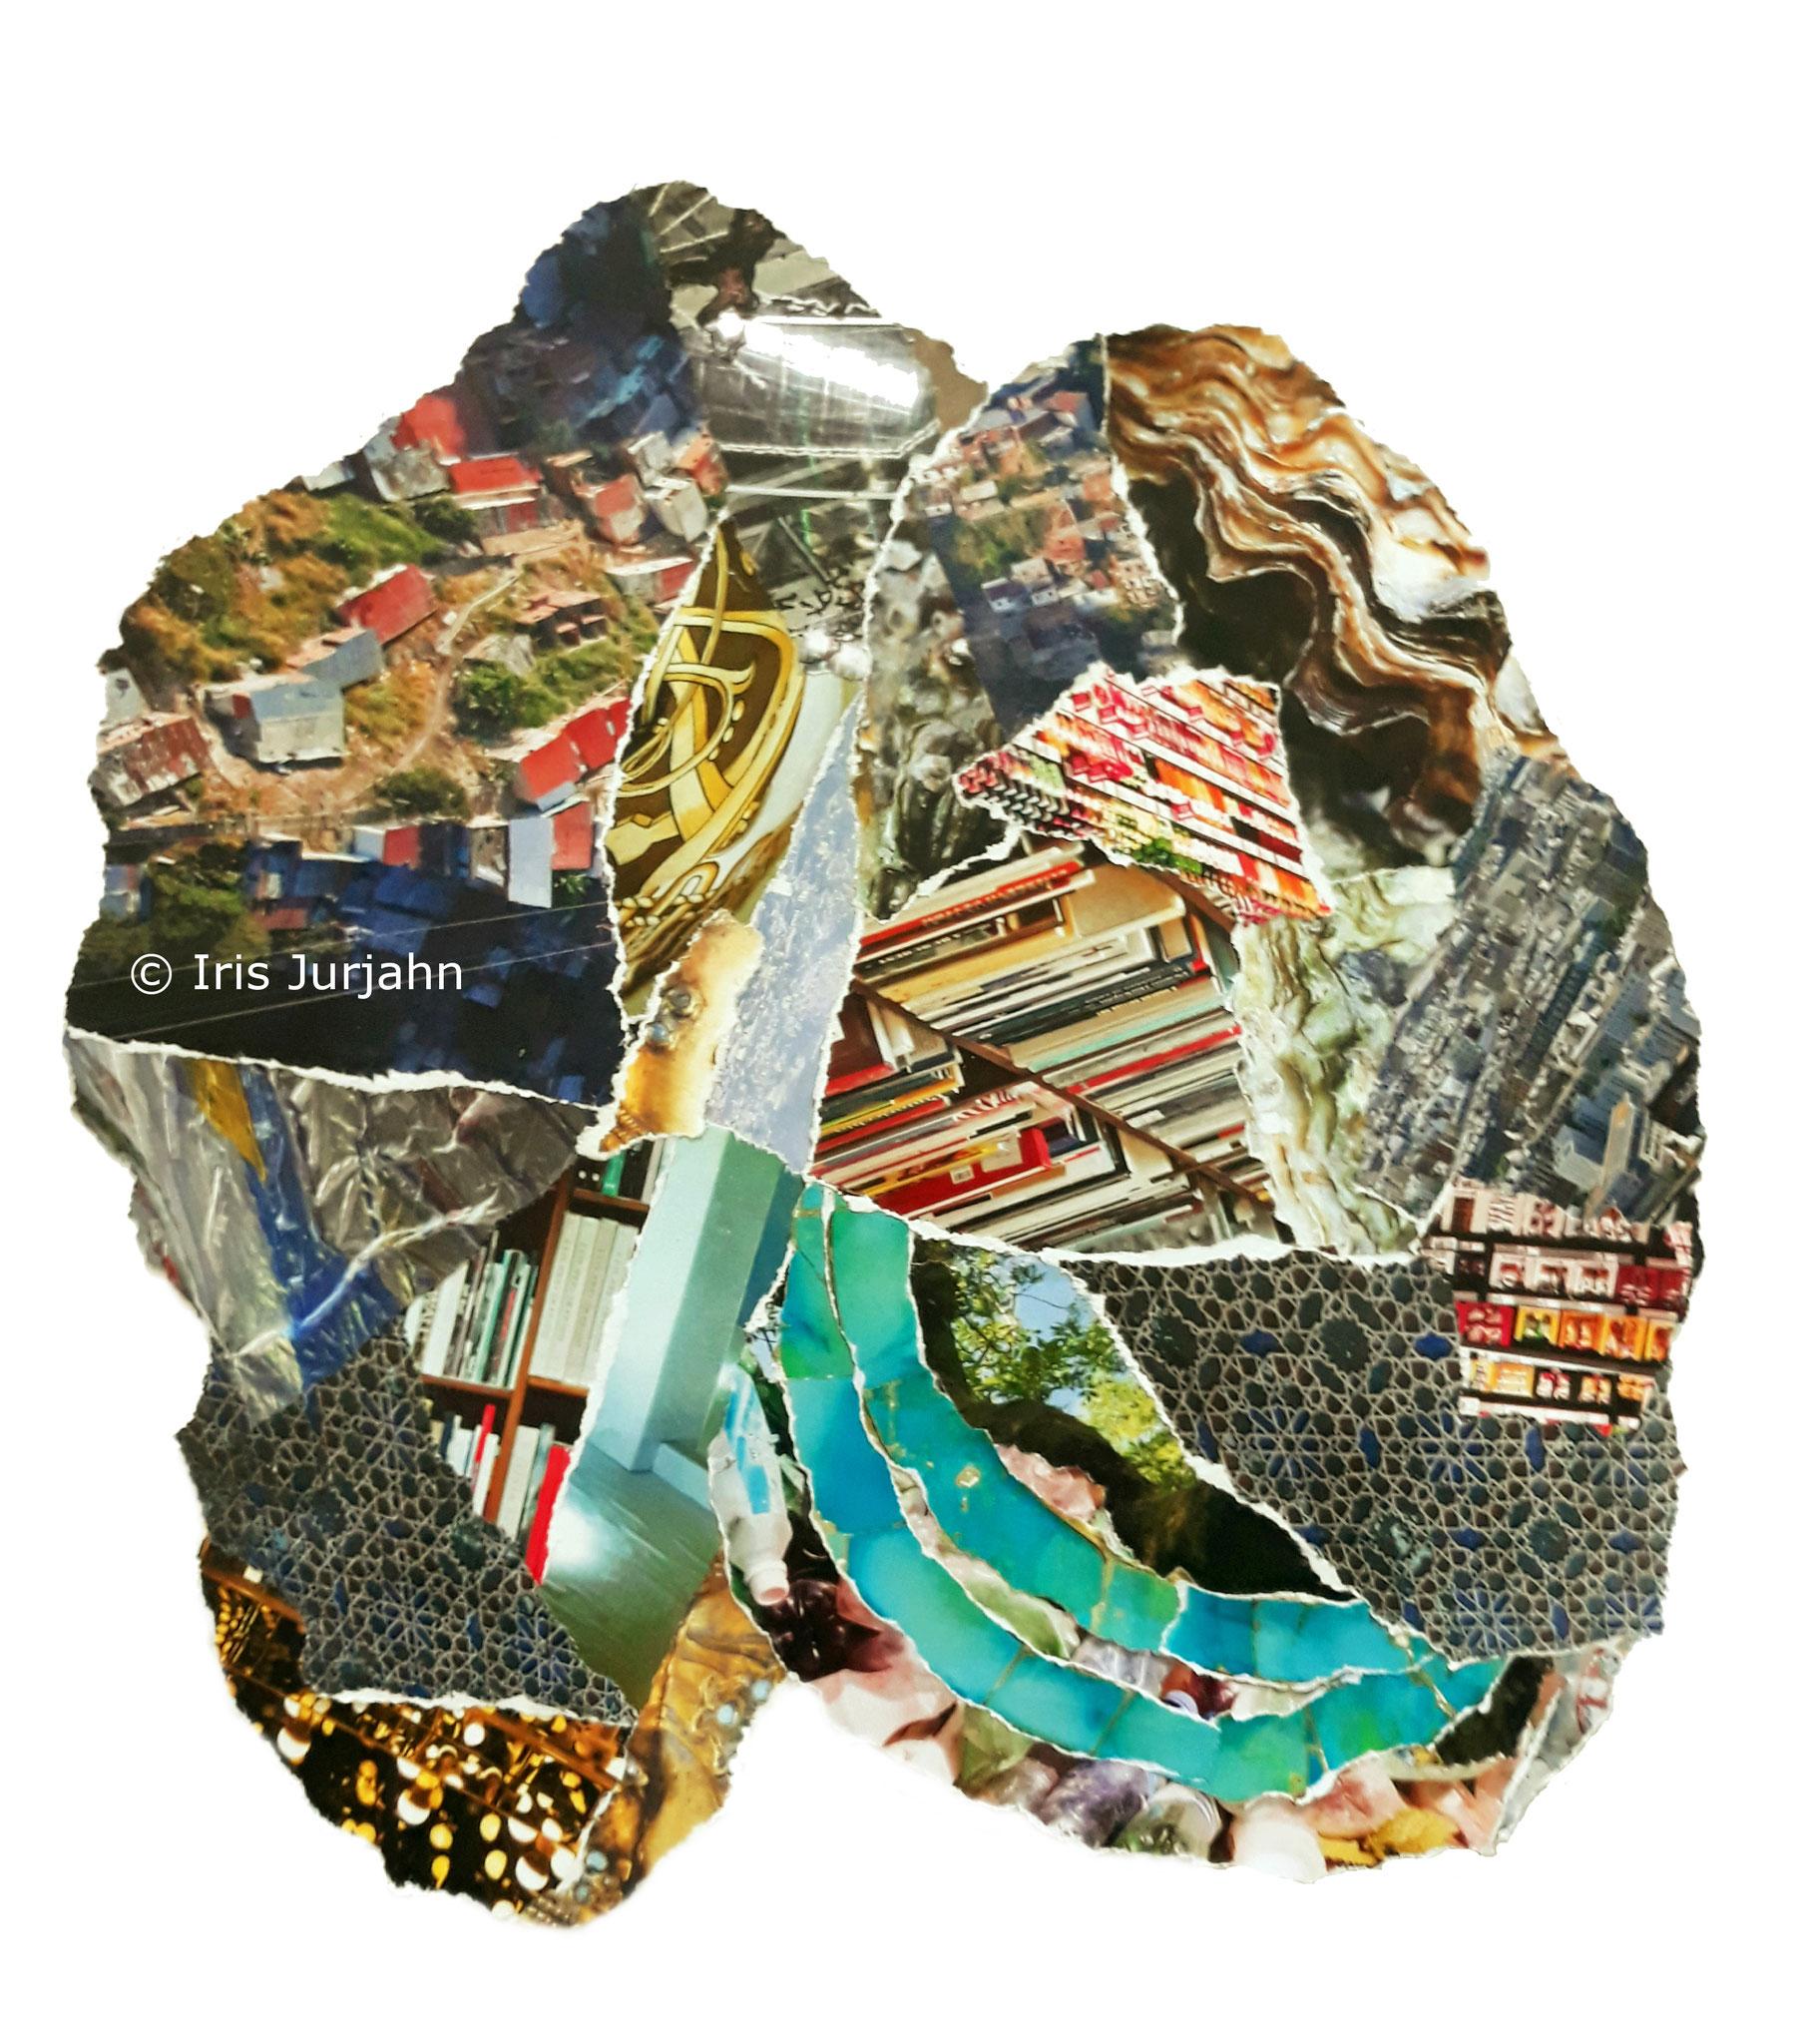 Brain, Papiercollage, 42 x 32 cm  (inkl. Objektrahmen), 2019